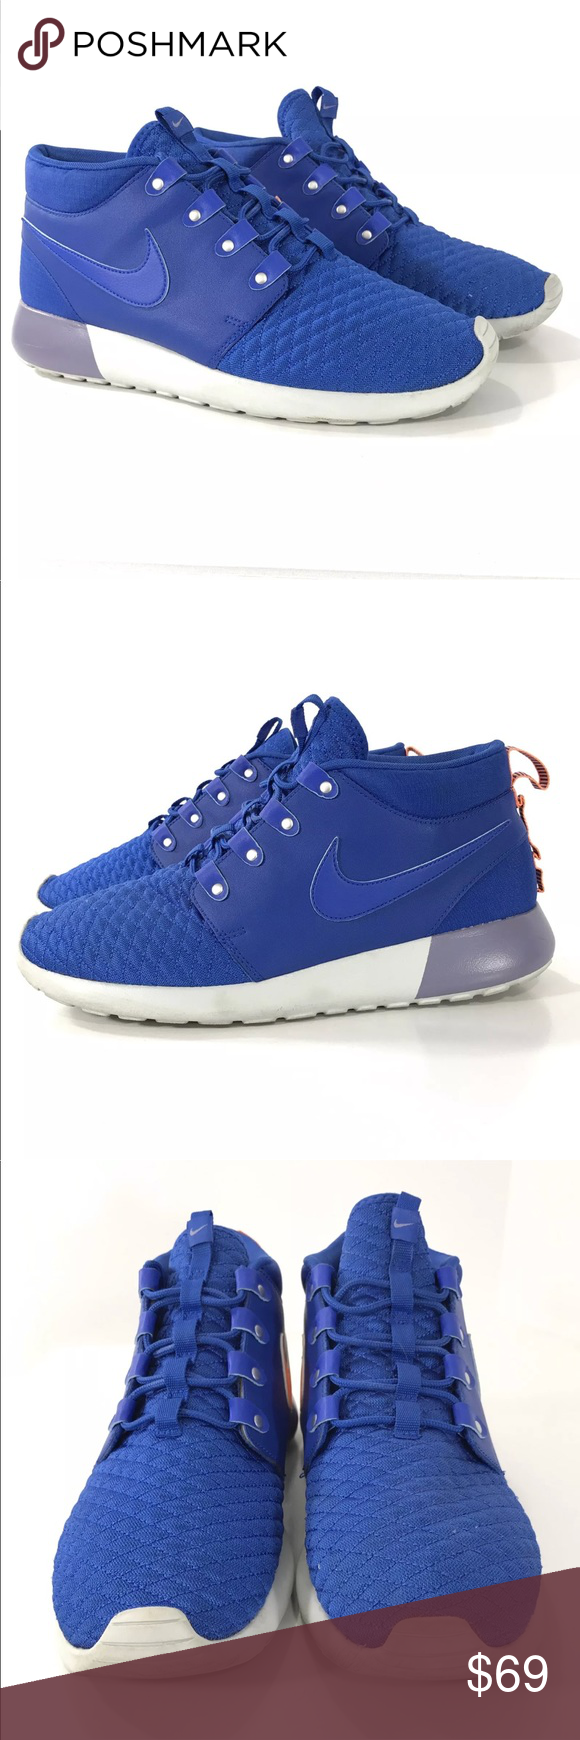 premium selection 2d161 b81ab NIKE Shoes Men s Roshe Run High Top Sneaker Boot NIKE Shoes Roshe Run Blue  Orange Leather